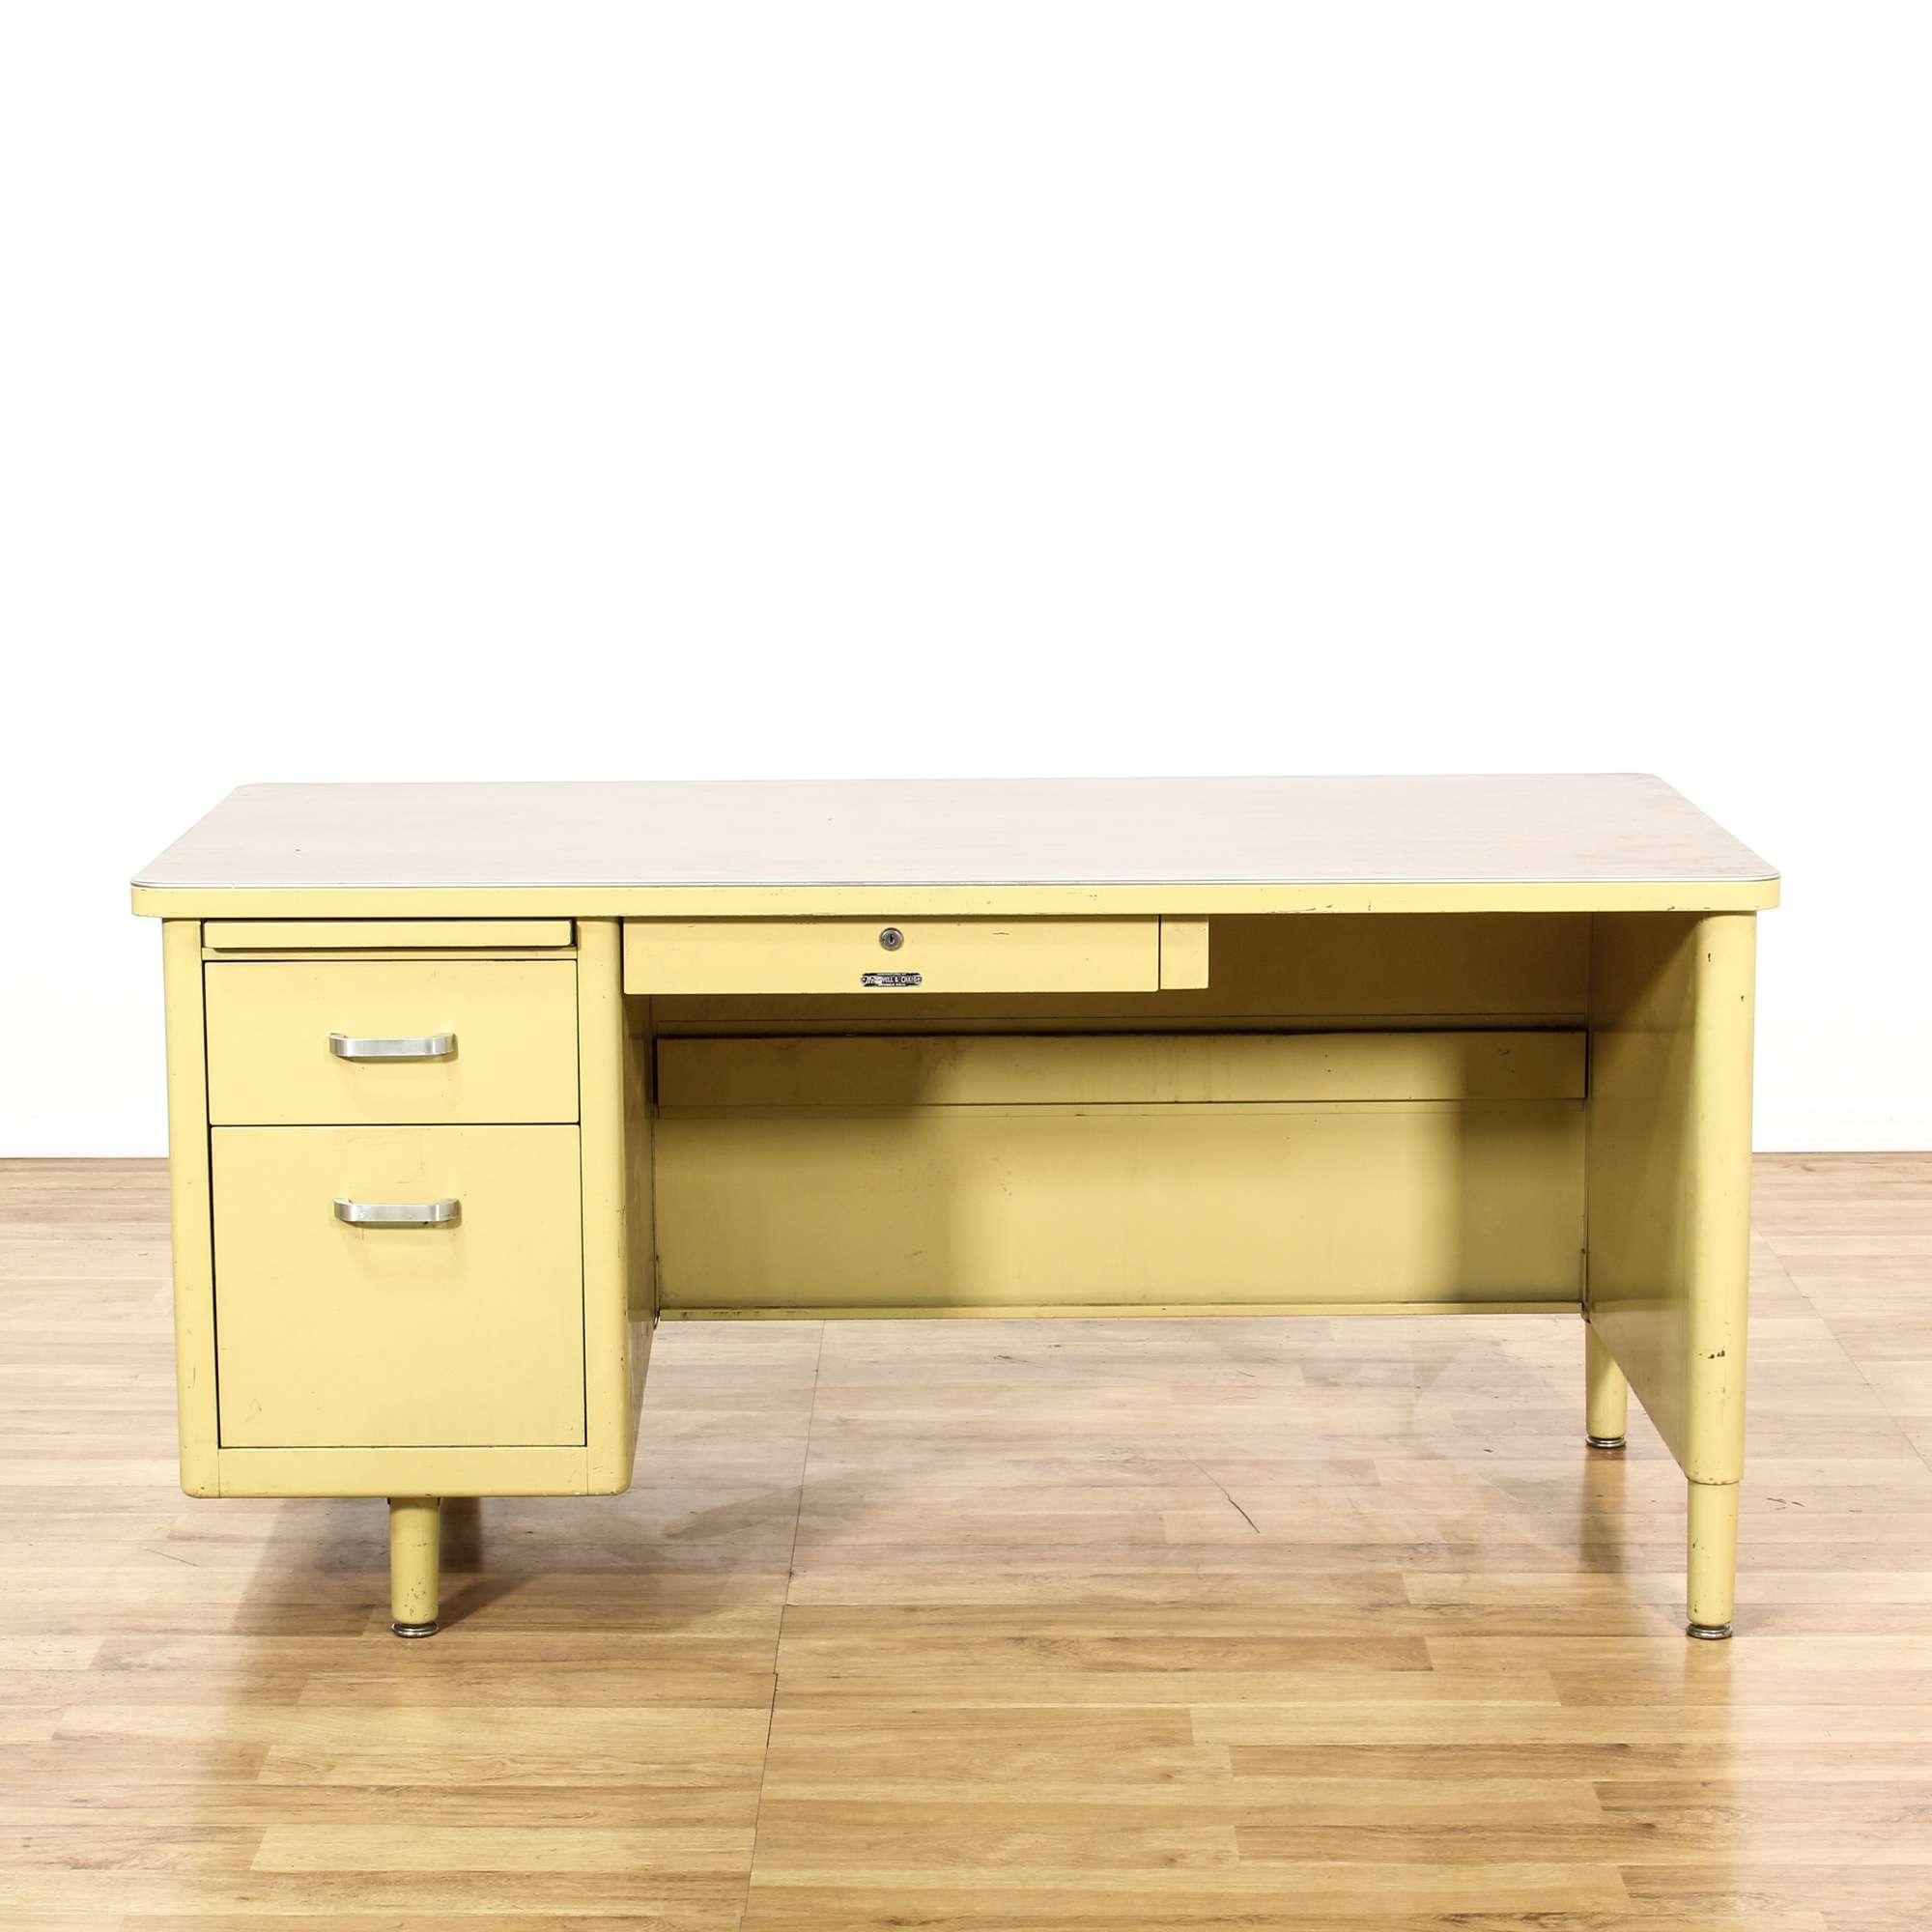 Retro Yellow Metal Tanker Desk Loveseat Vintage Furniture Los Angeles